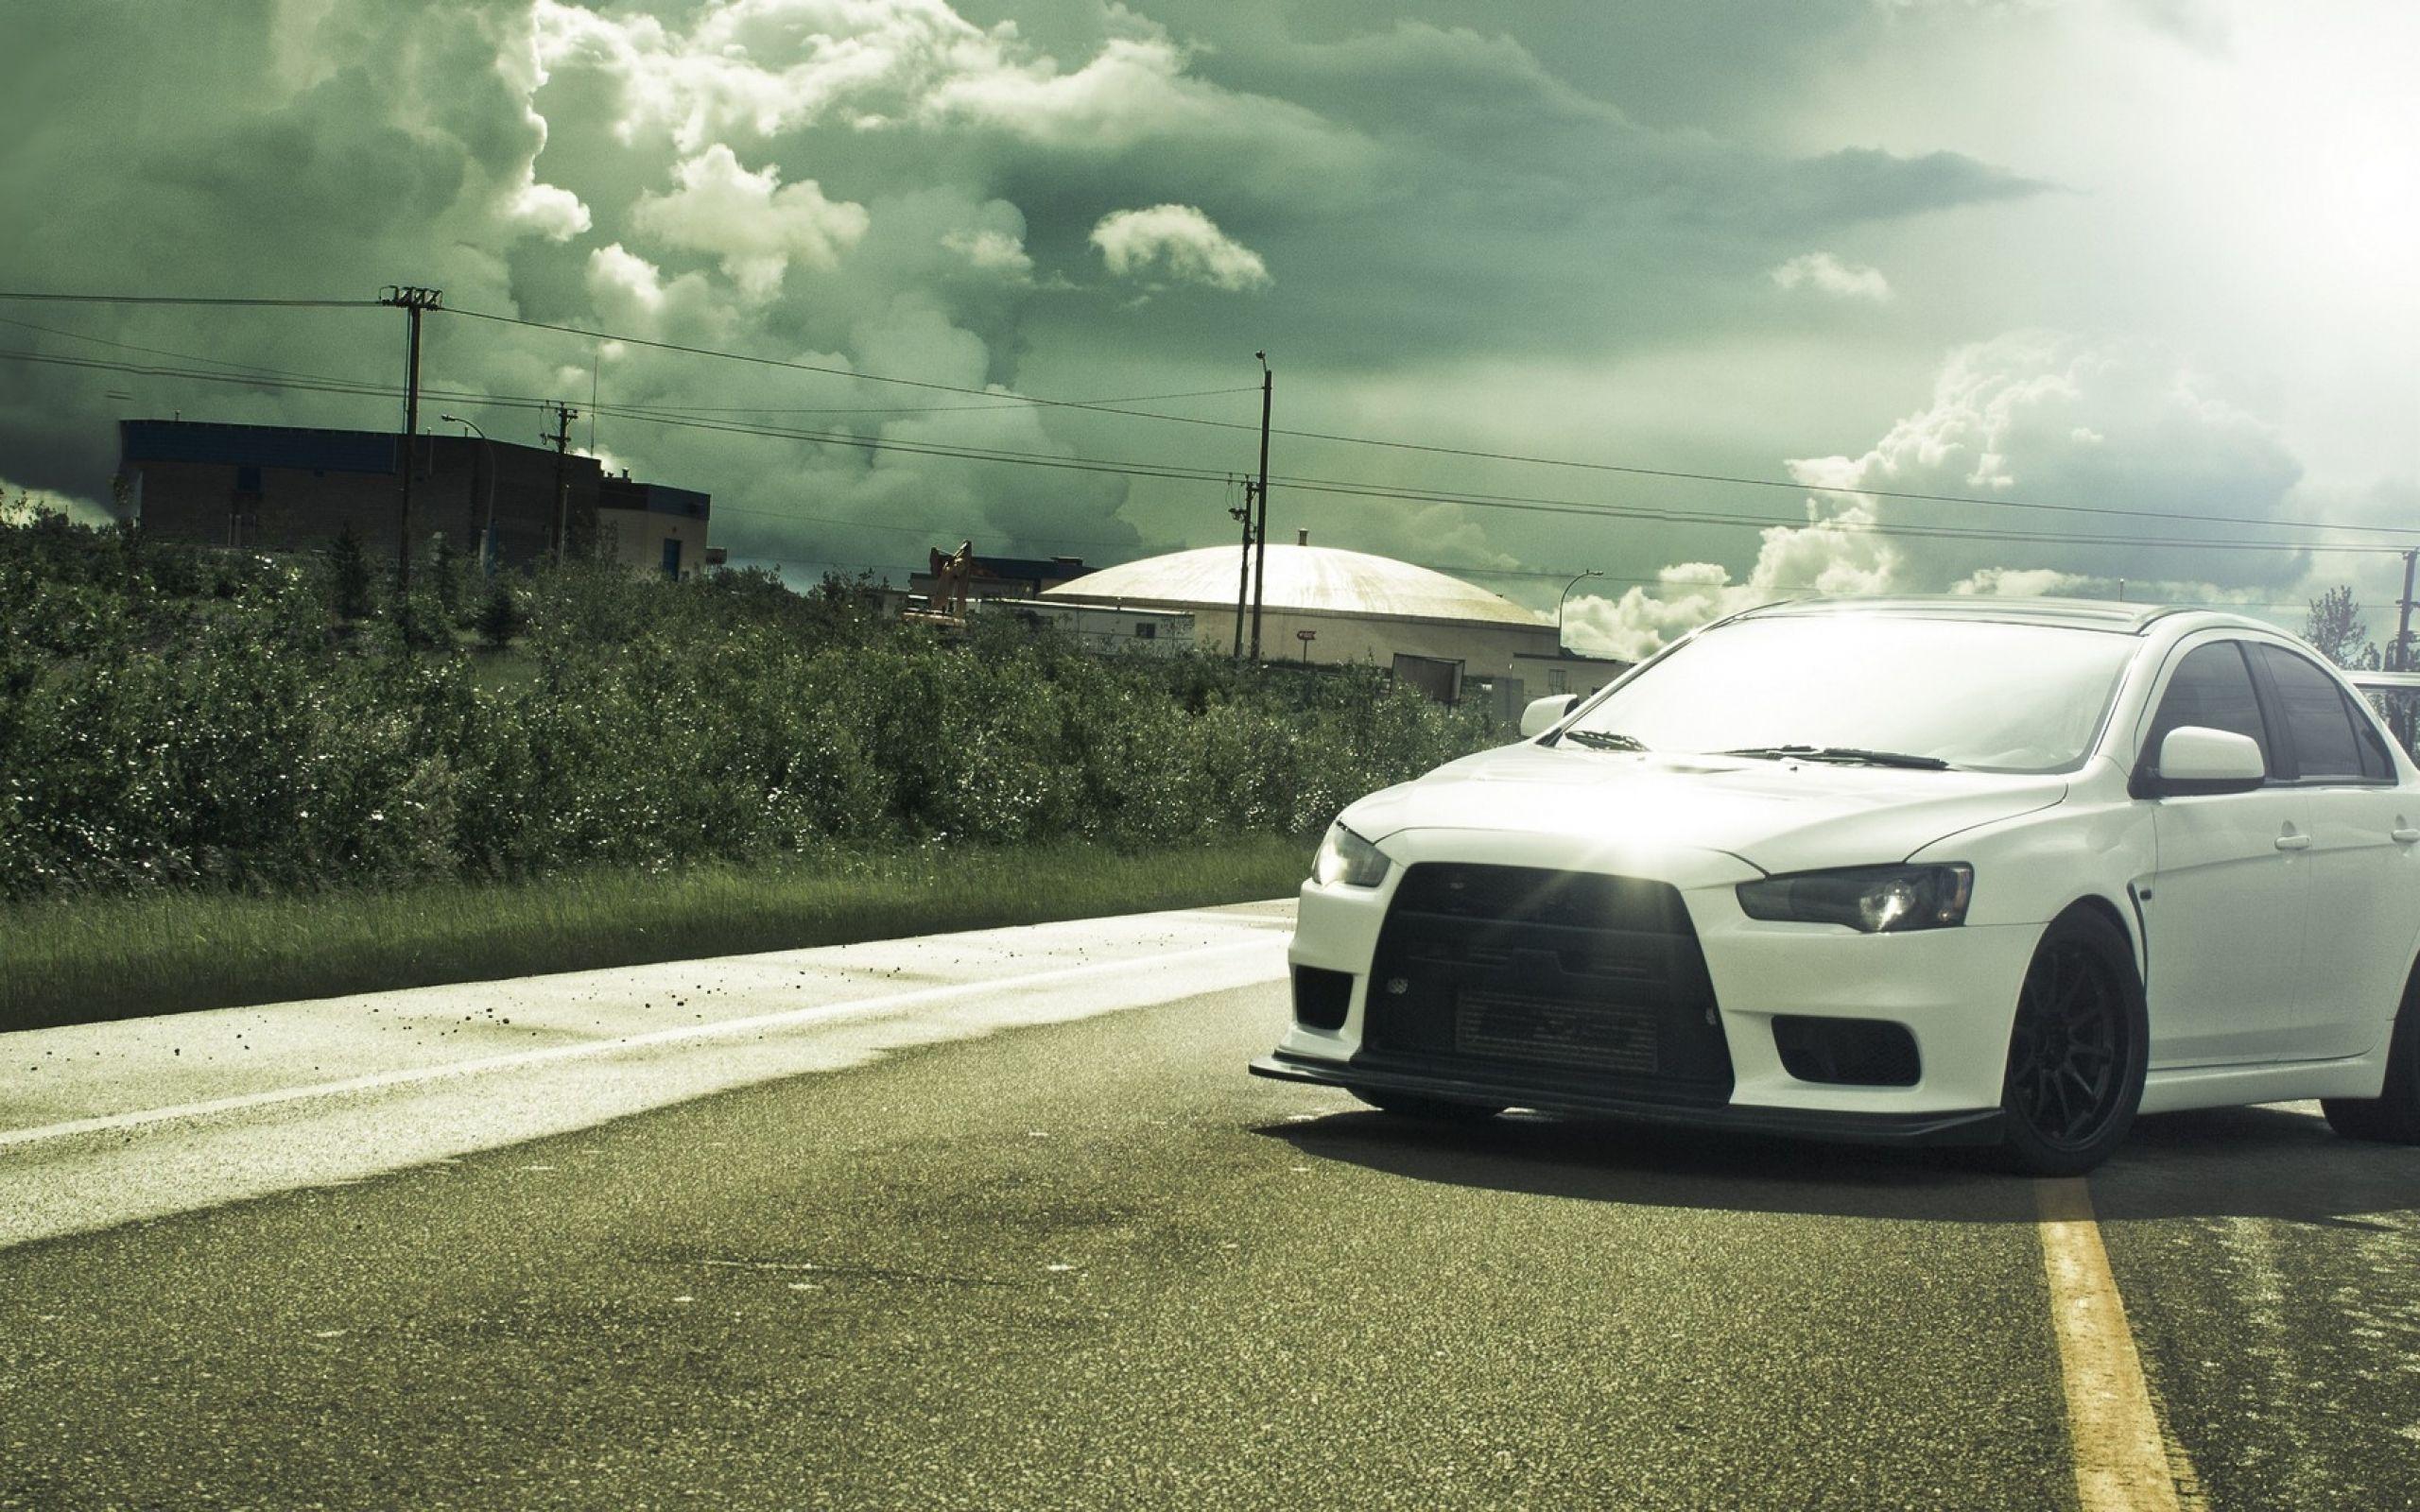 Mitsubishi Lancer White Wallpaper For Iphone Med Bilder